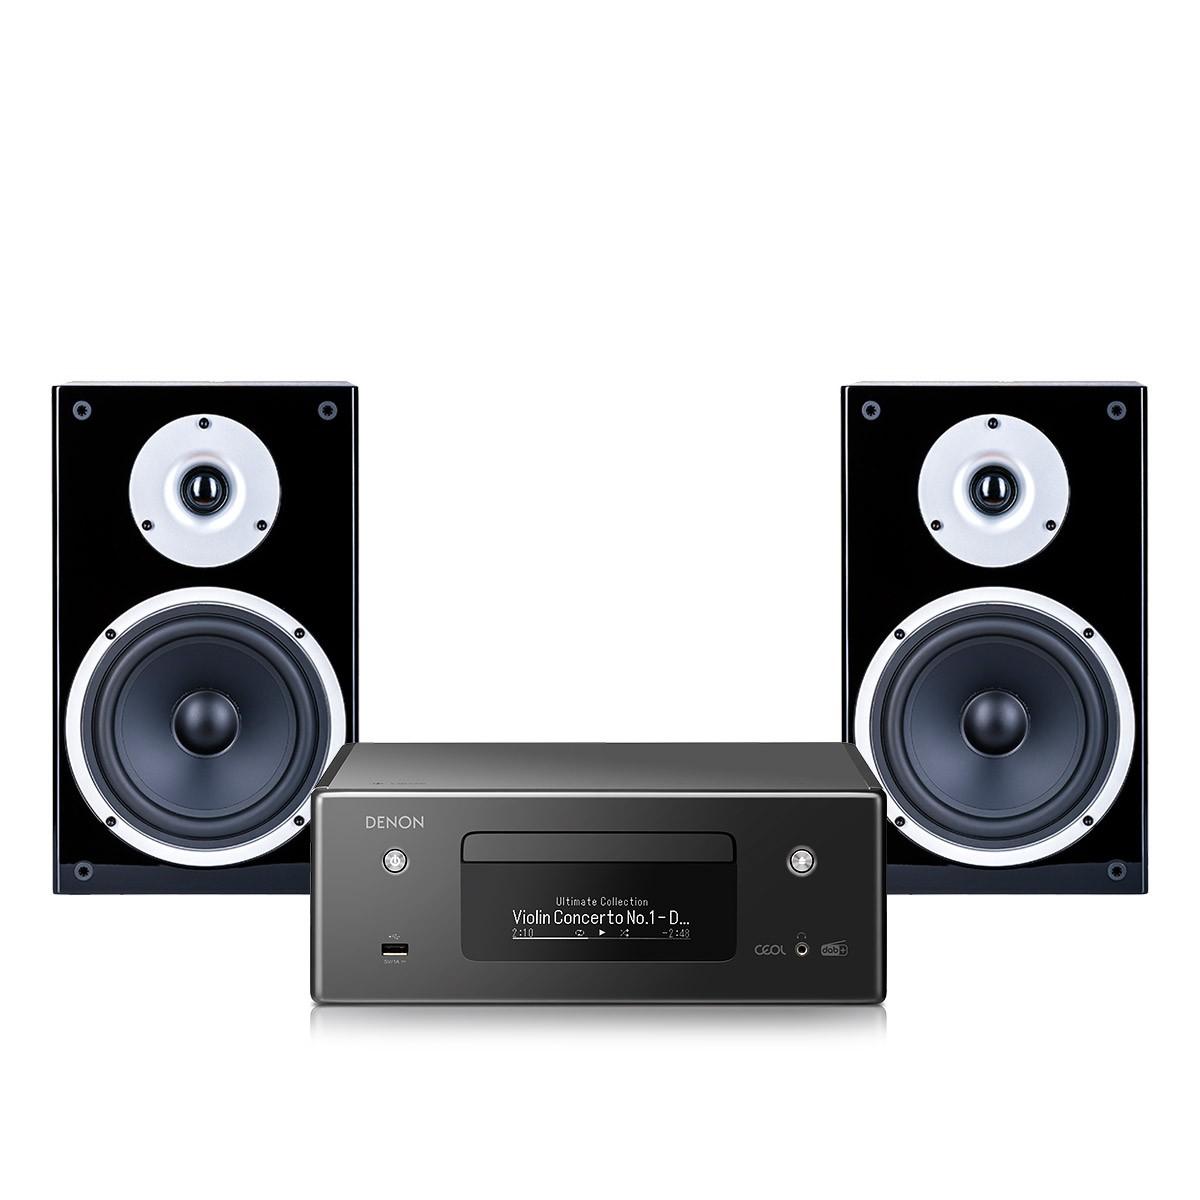 Amplituner stereo z CD RCDN-11 DAB